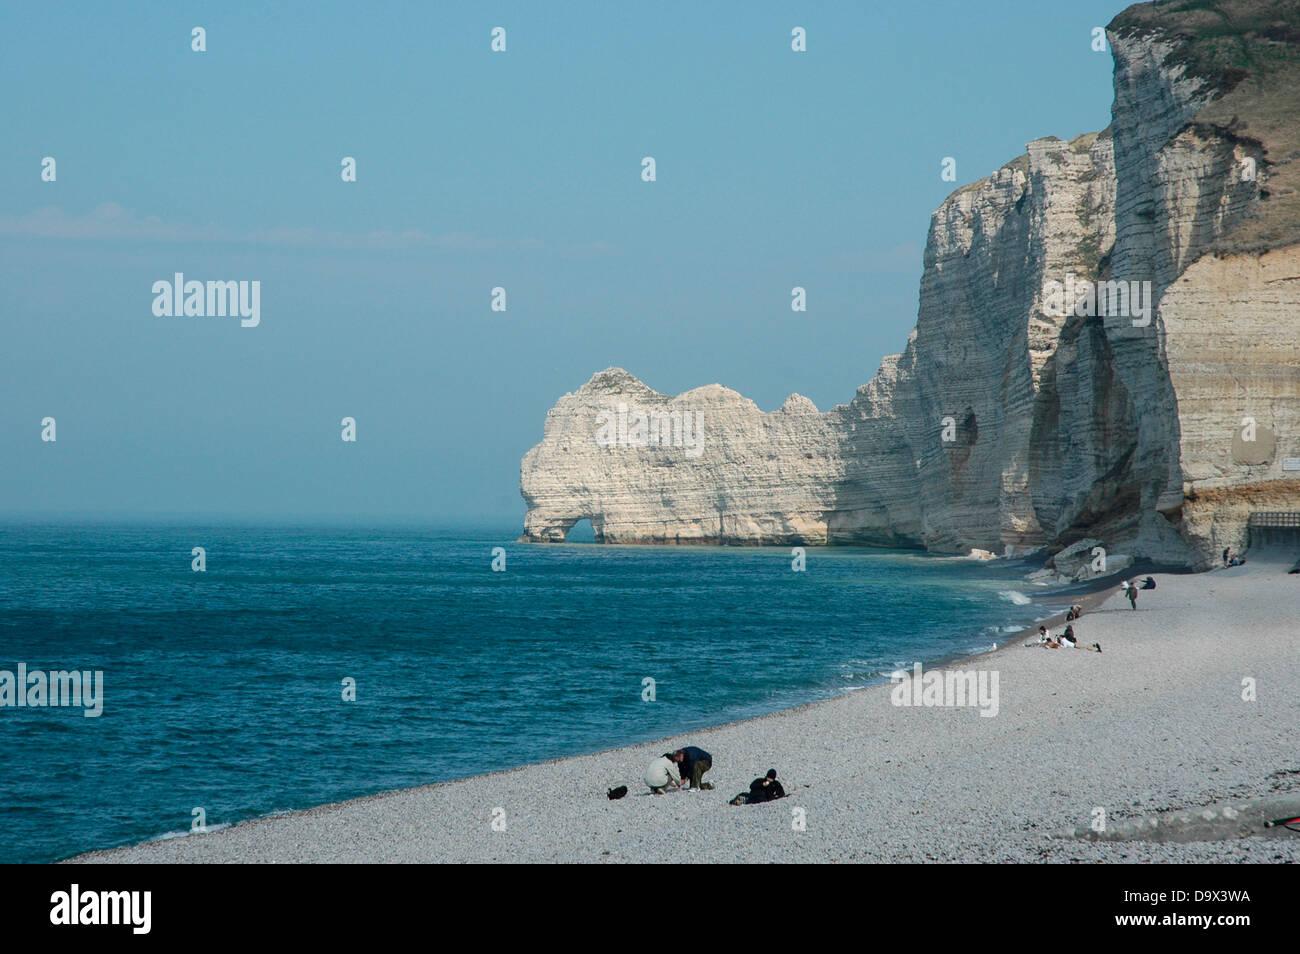 Kueste Steilkueste Felsen Natur Nature Kies Strand Normandie Frankreich High Resolution Stock Photography And Images Alamy